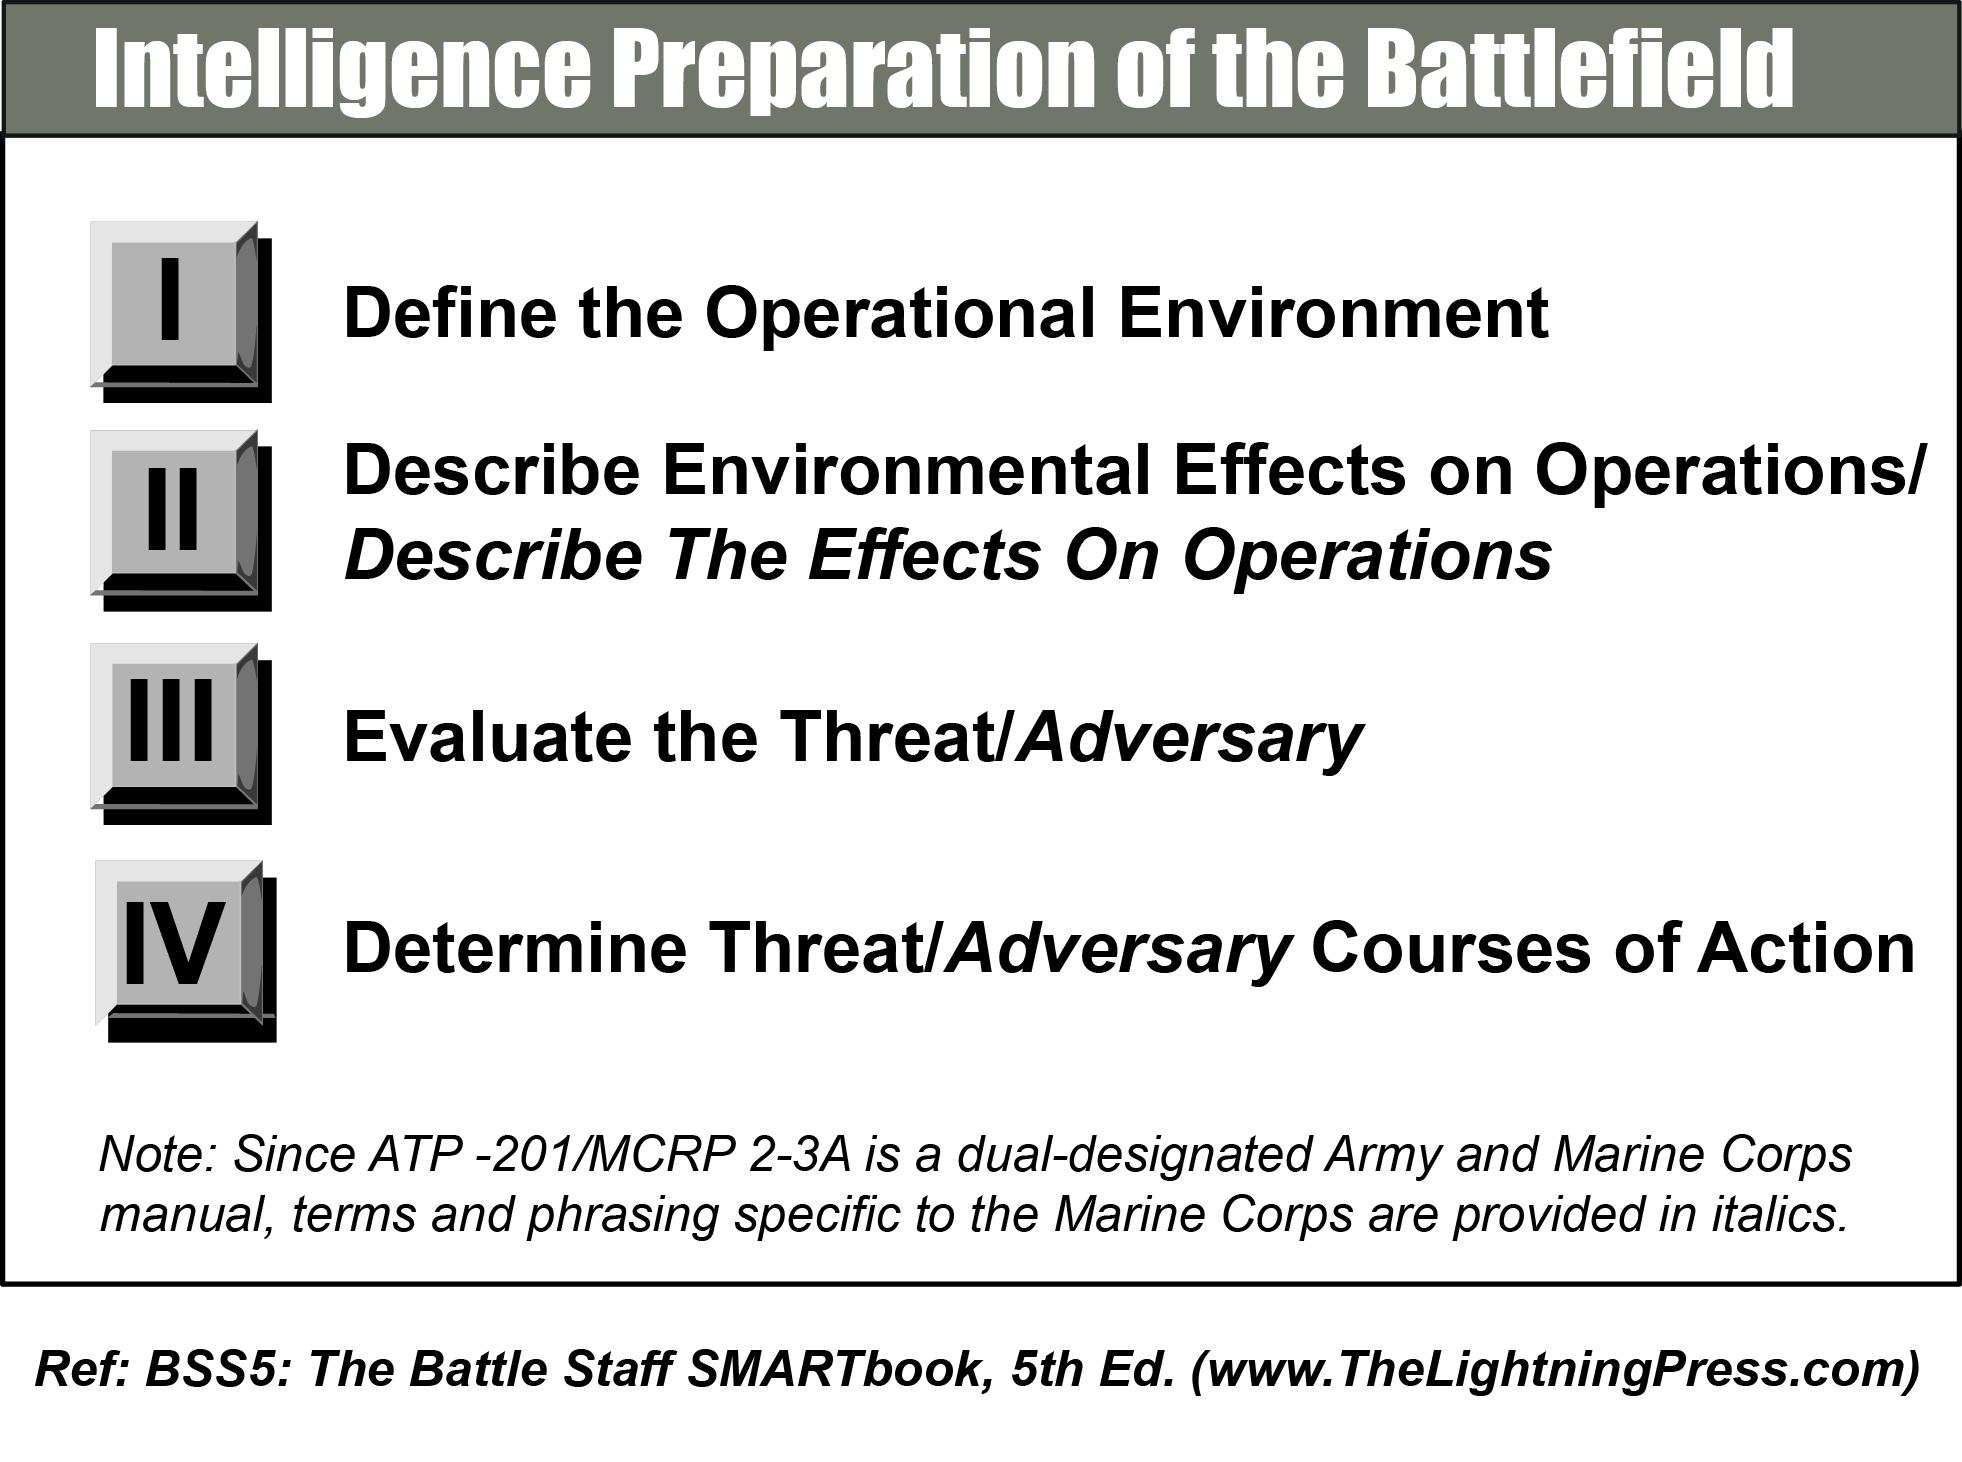 Intelligence Preparation of the Battlefield IPB  The Lightning Press SMARTbooks